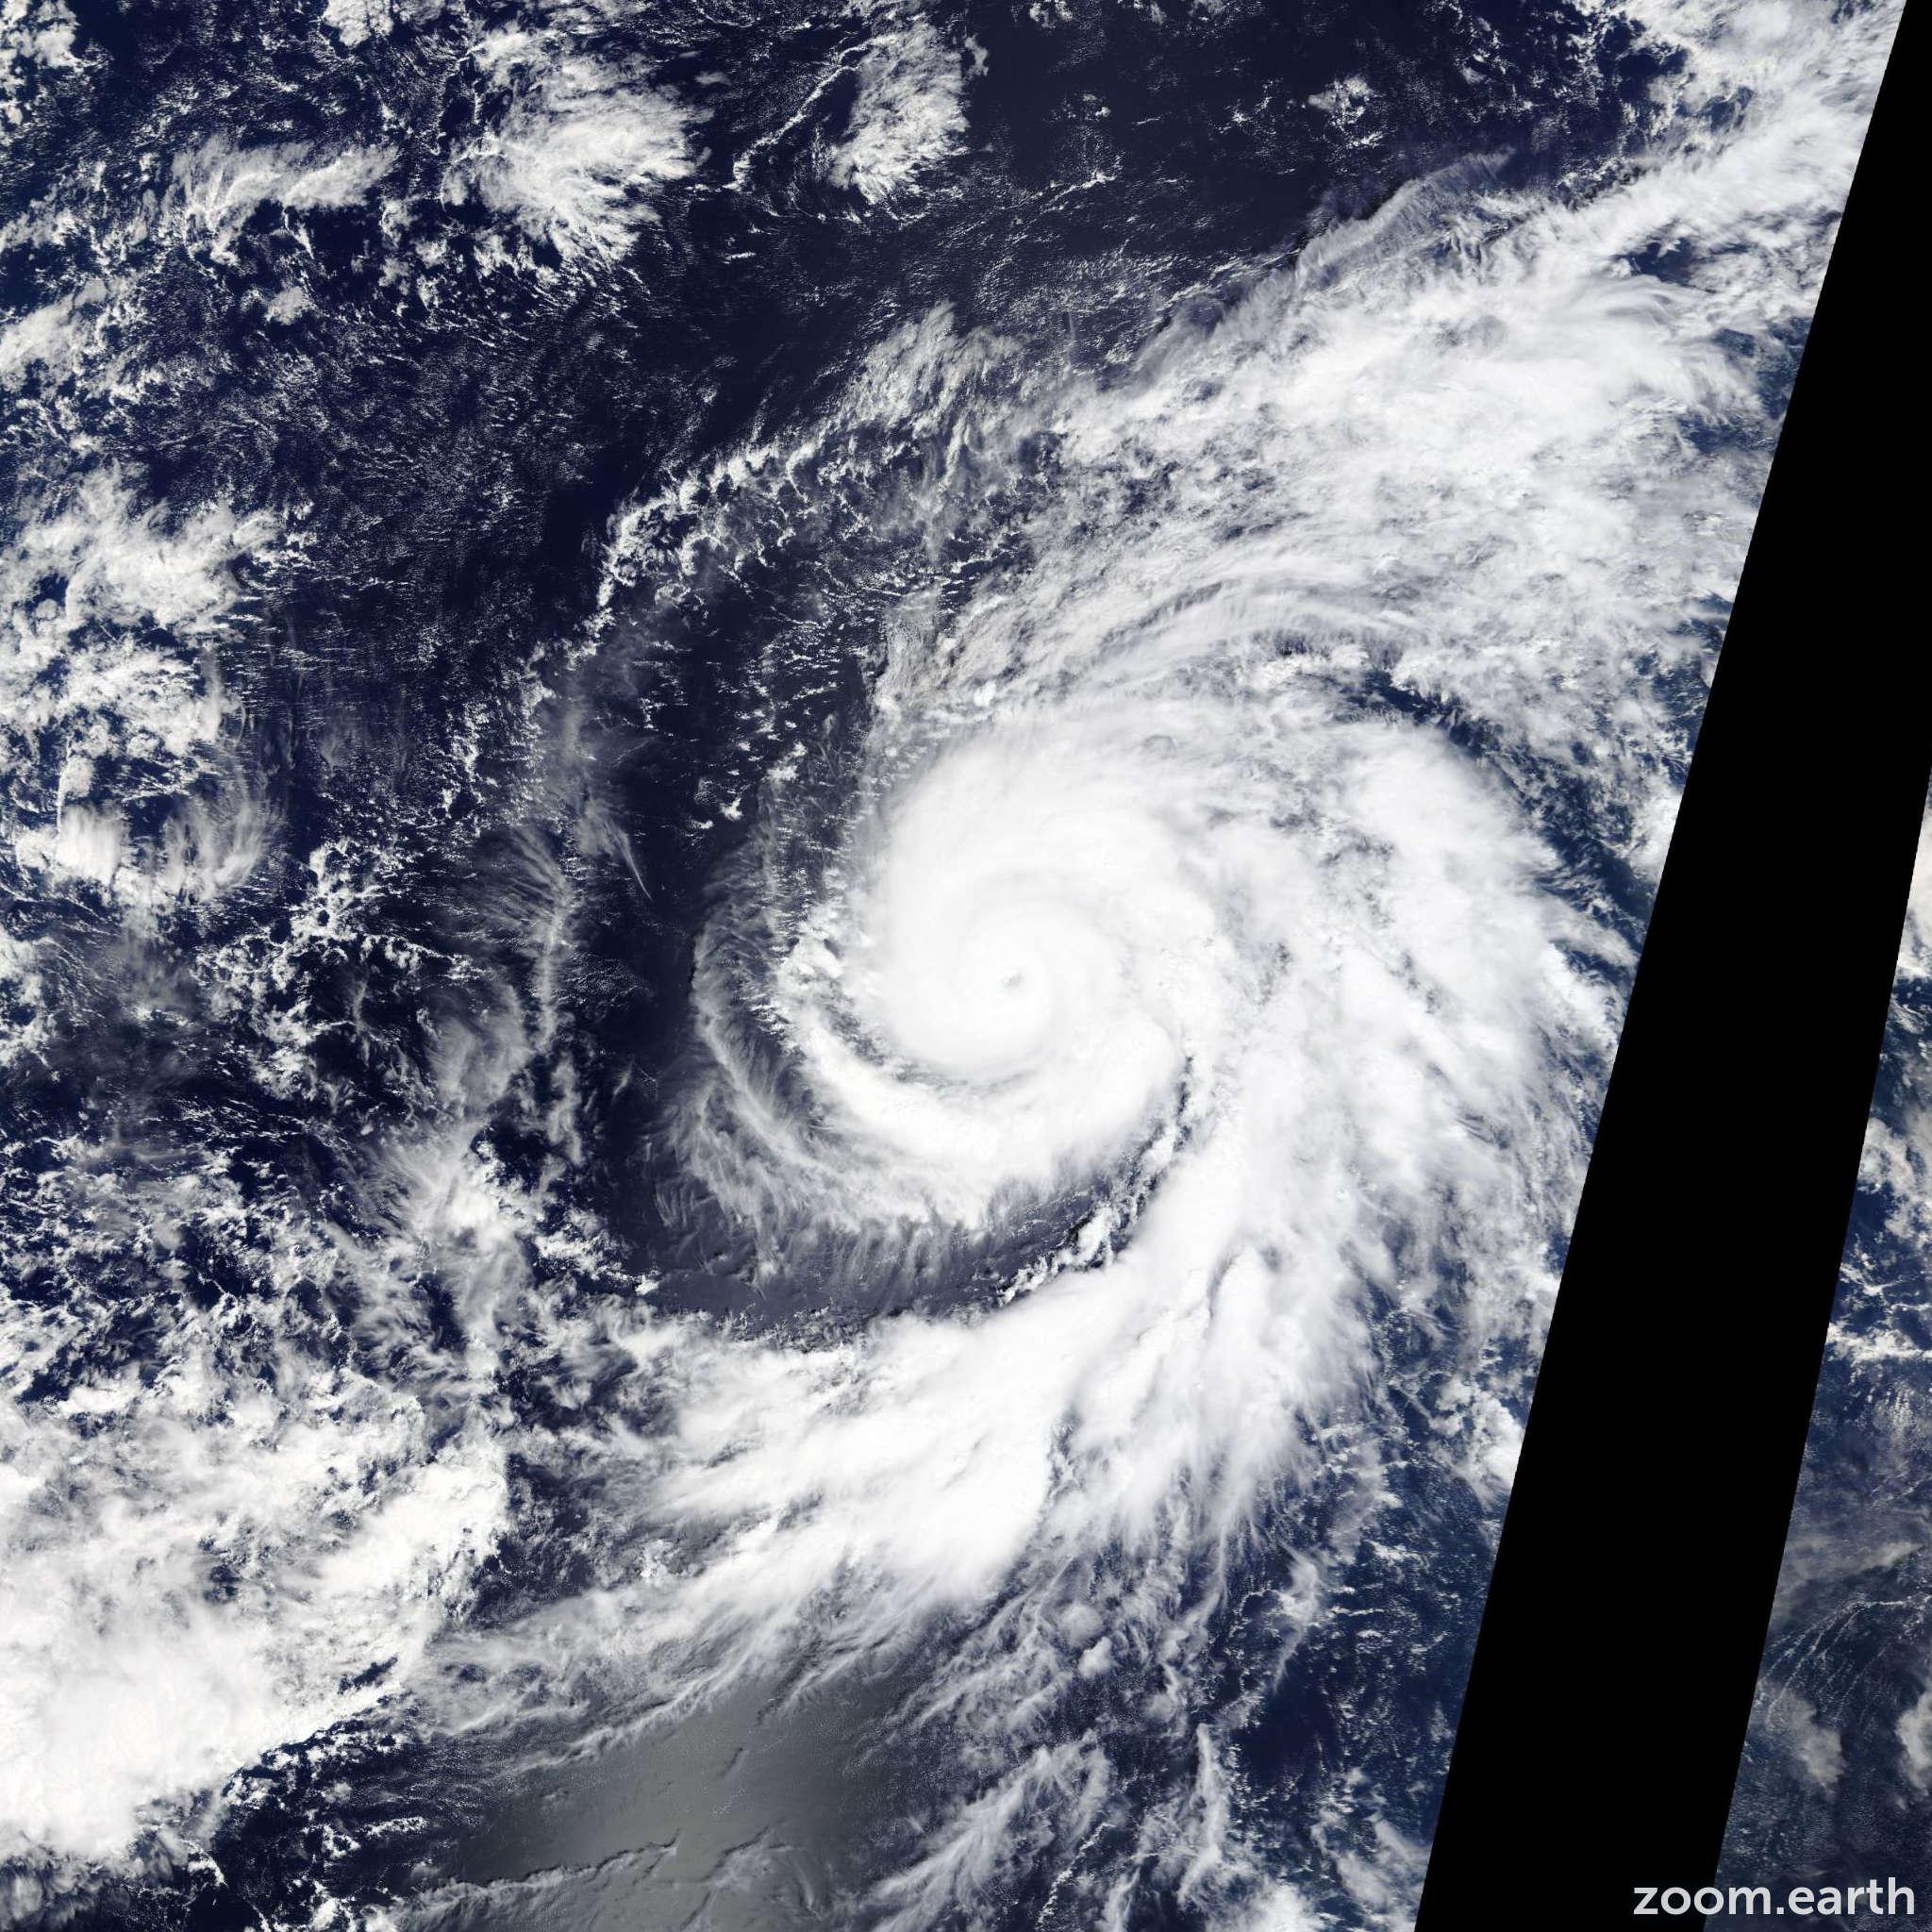 Satellite image of Hurricane Olaf 2015